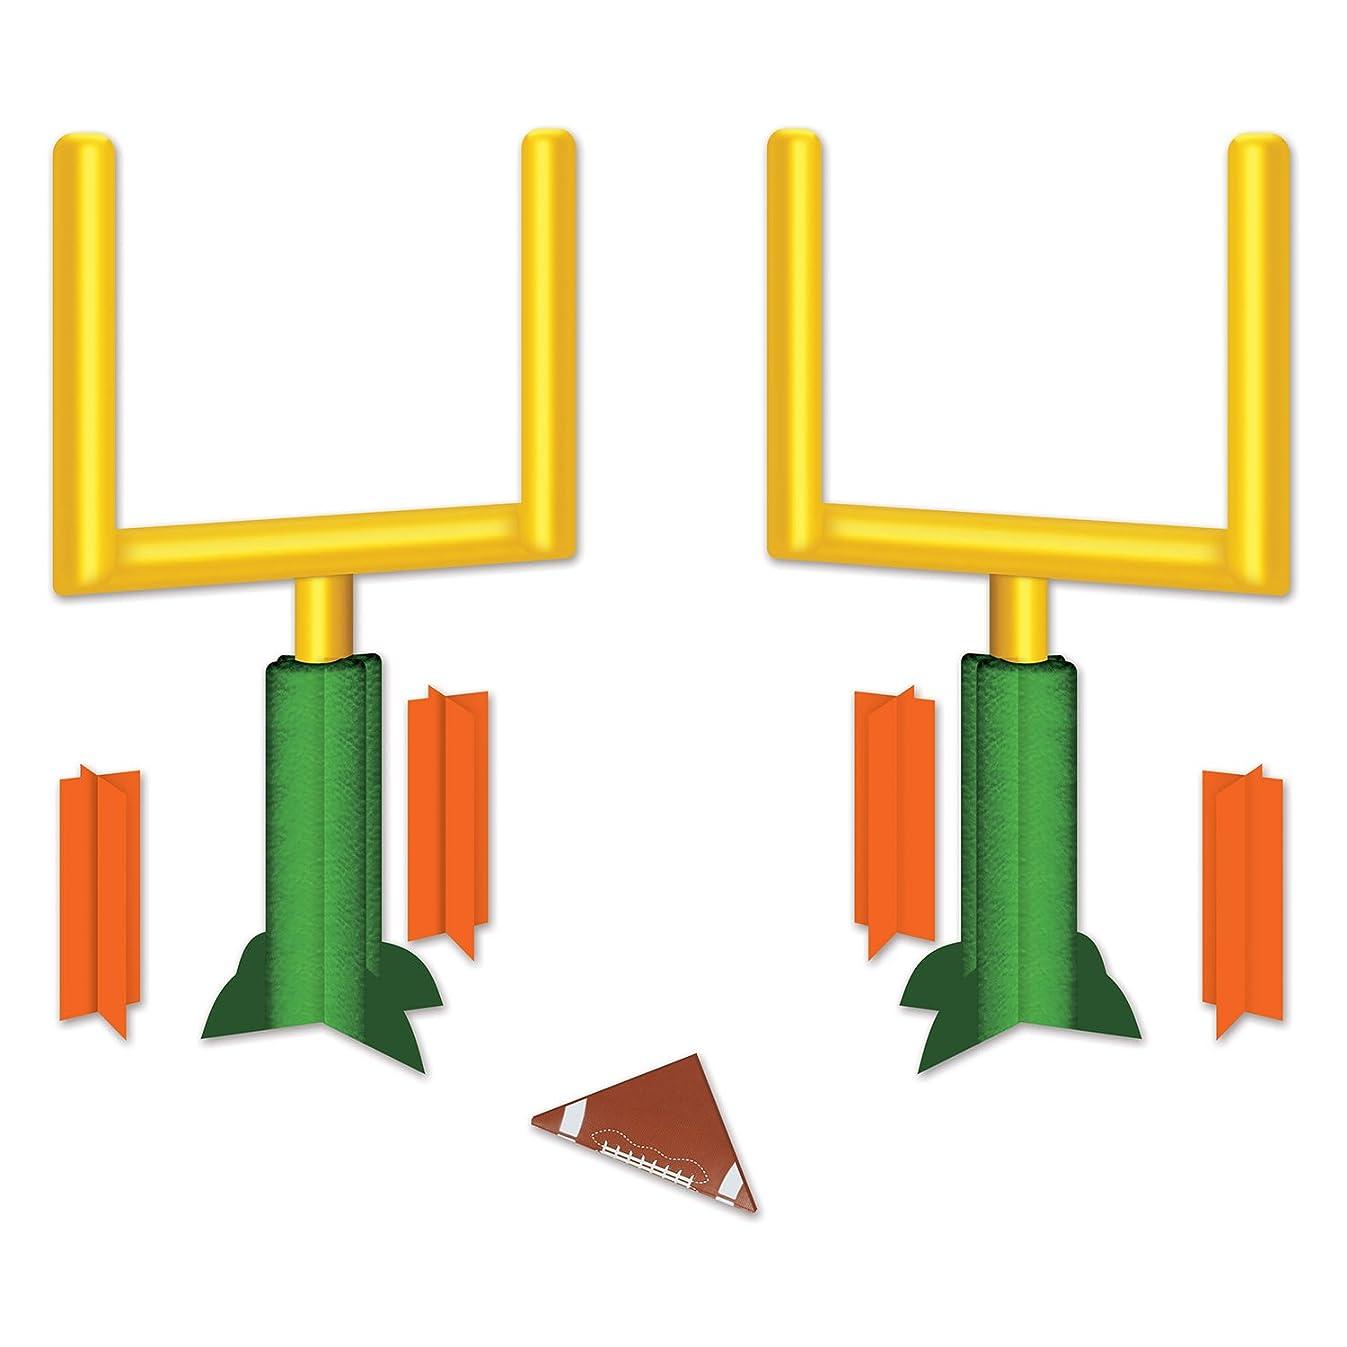 Beistle 54884 3-D Football Goal Post Centerpieces (2 Pack), 11